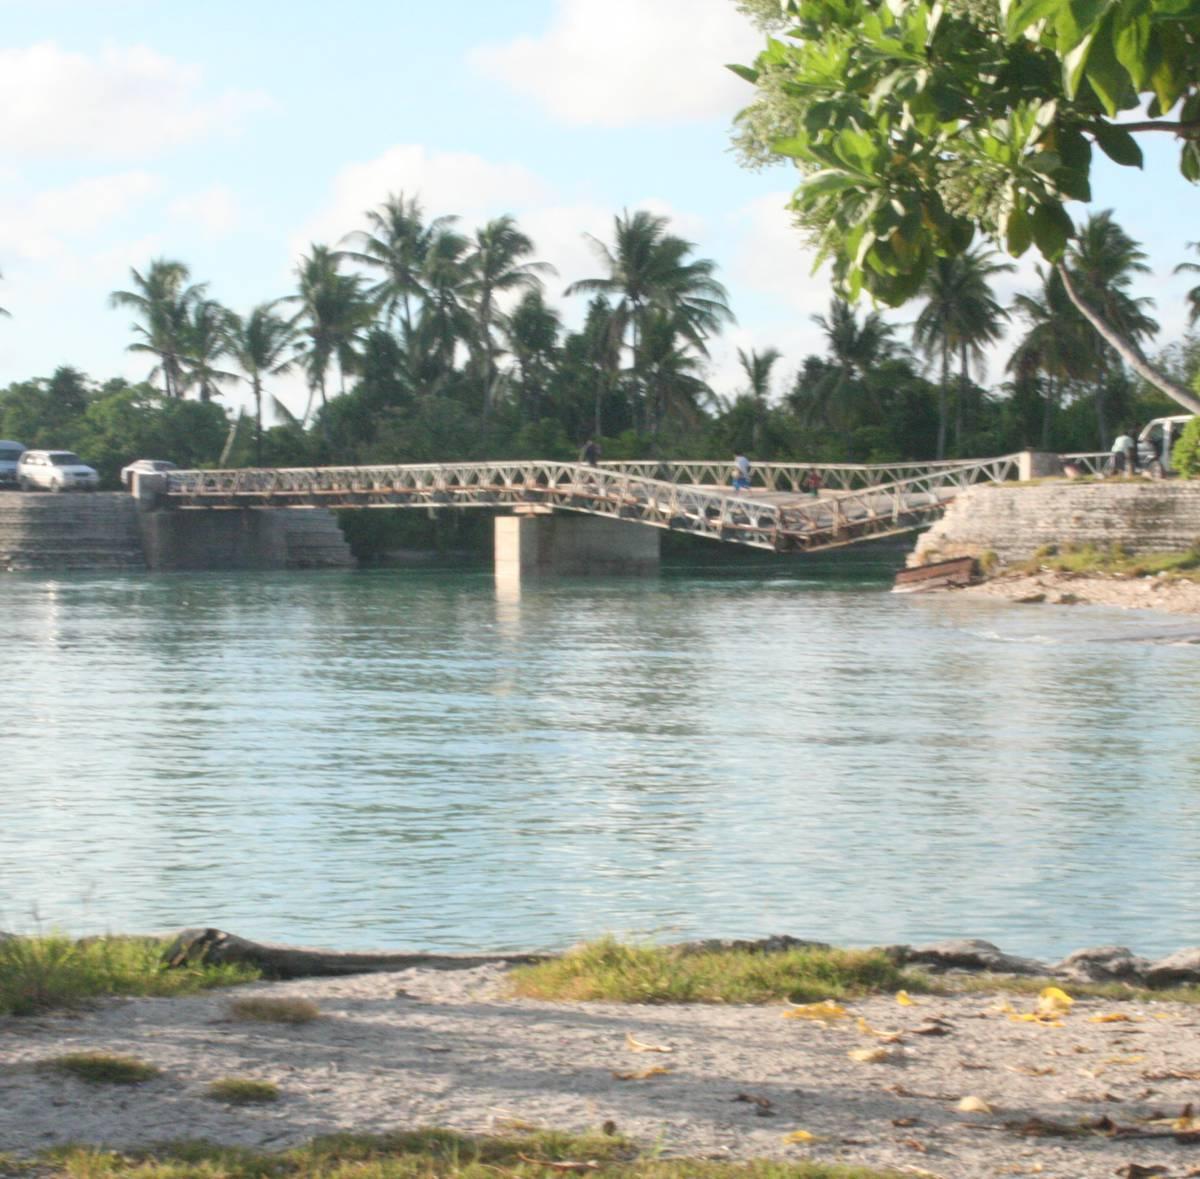 Kiribati upgrades its entire road network